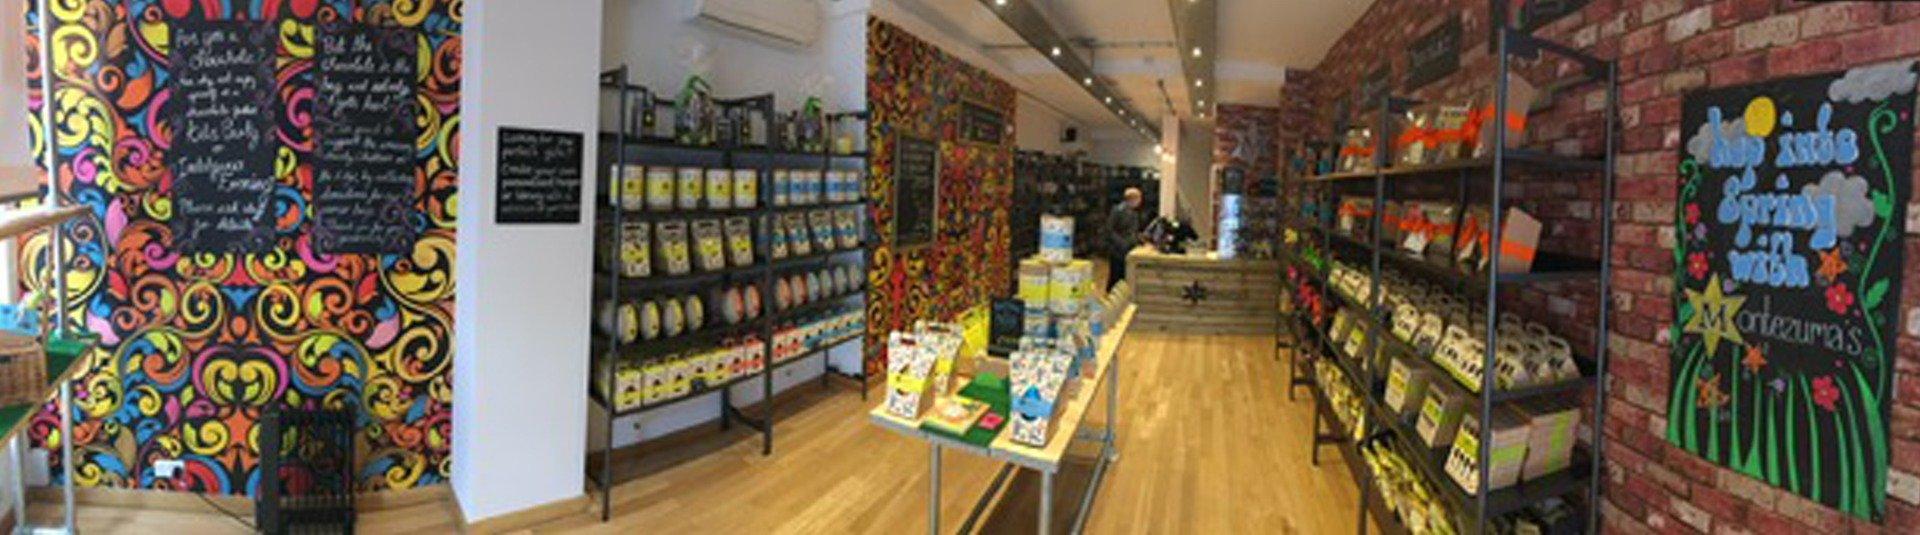 Our Brighton Shop